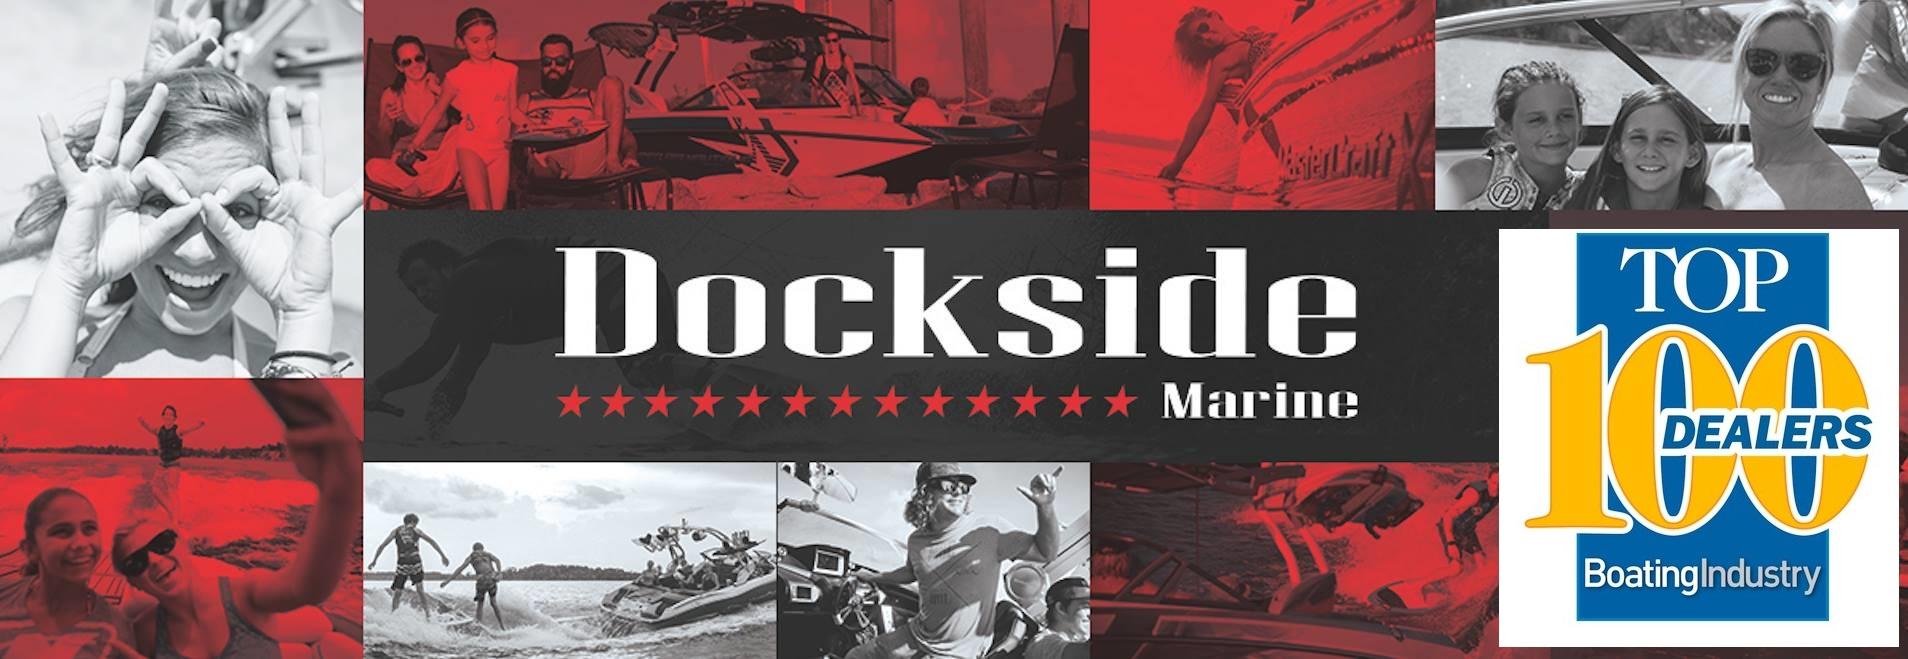 Dockside Marine